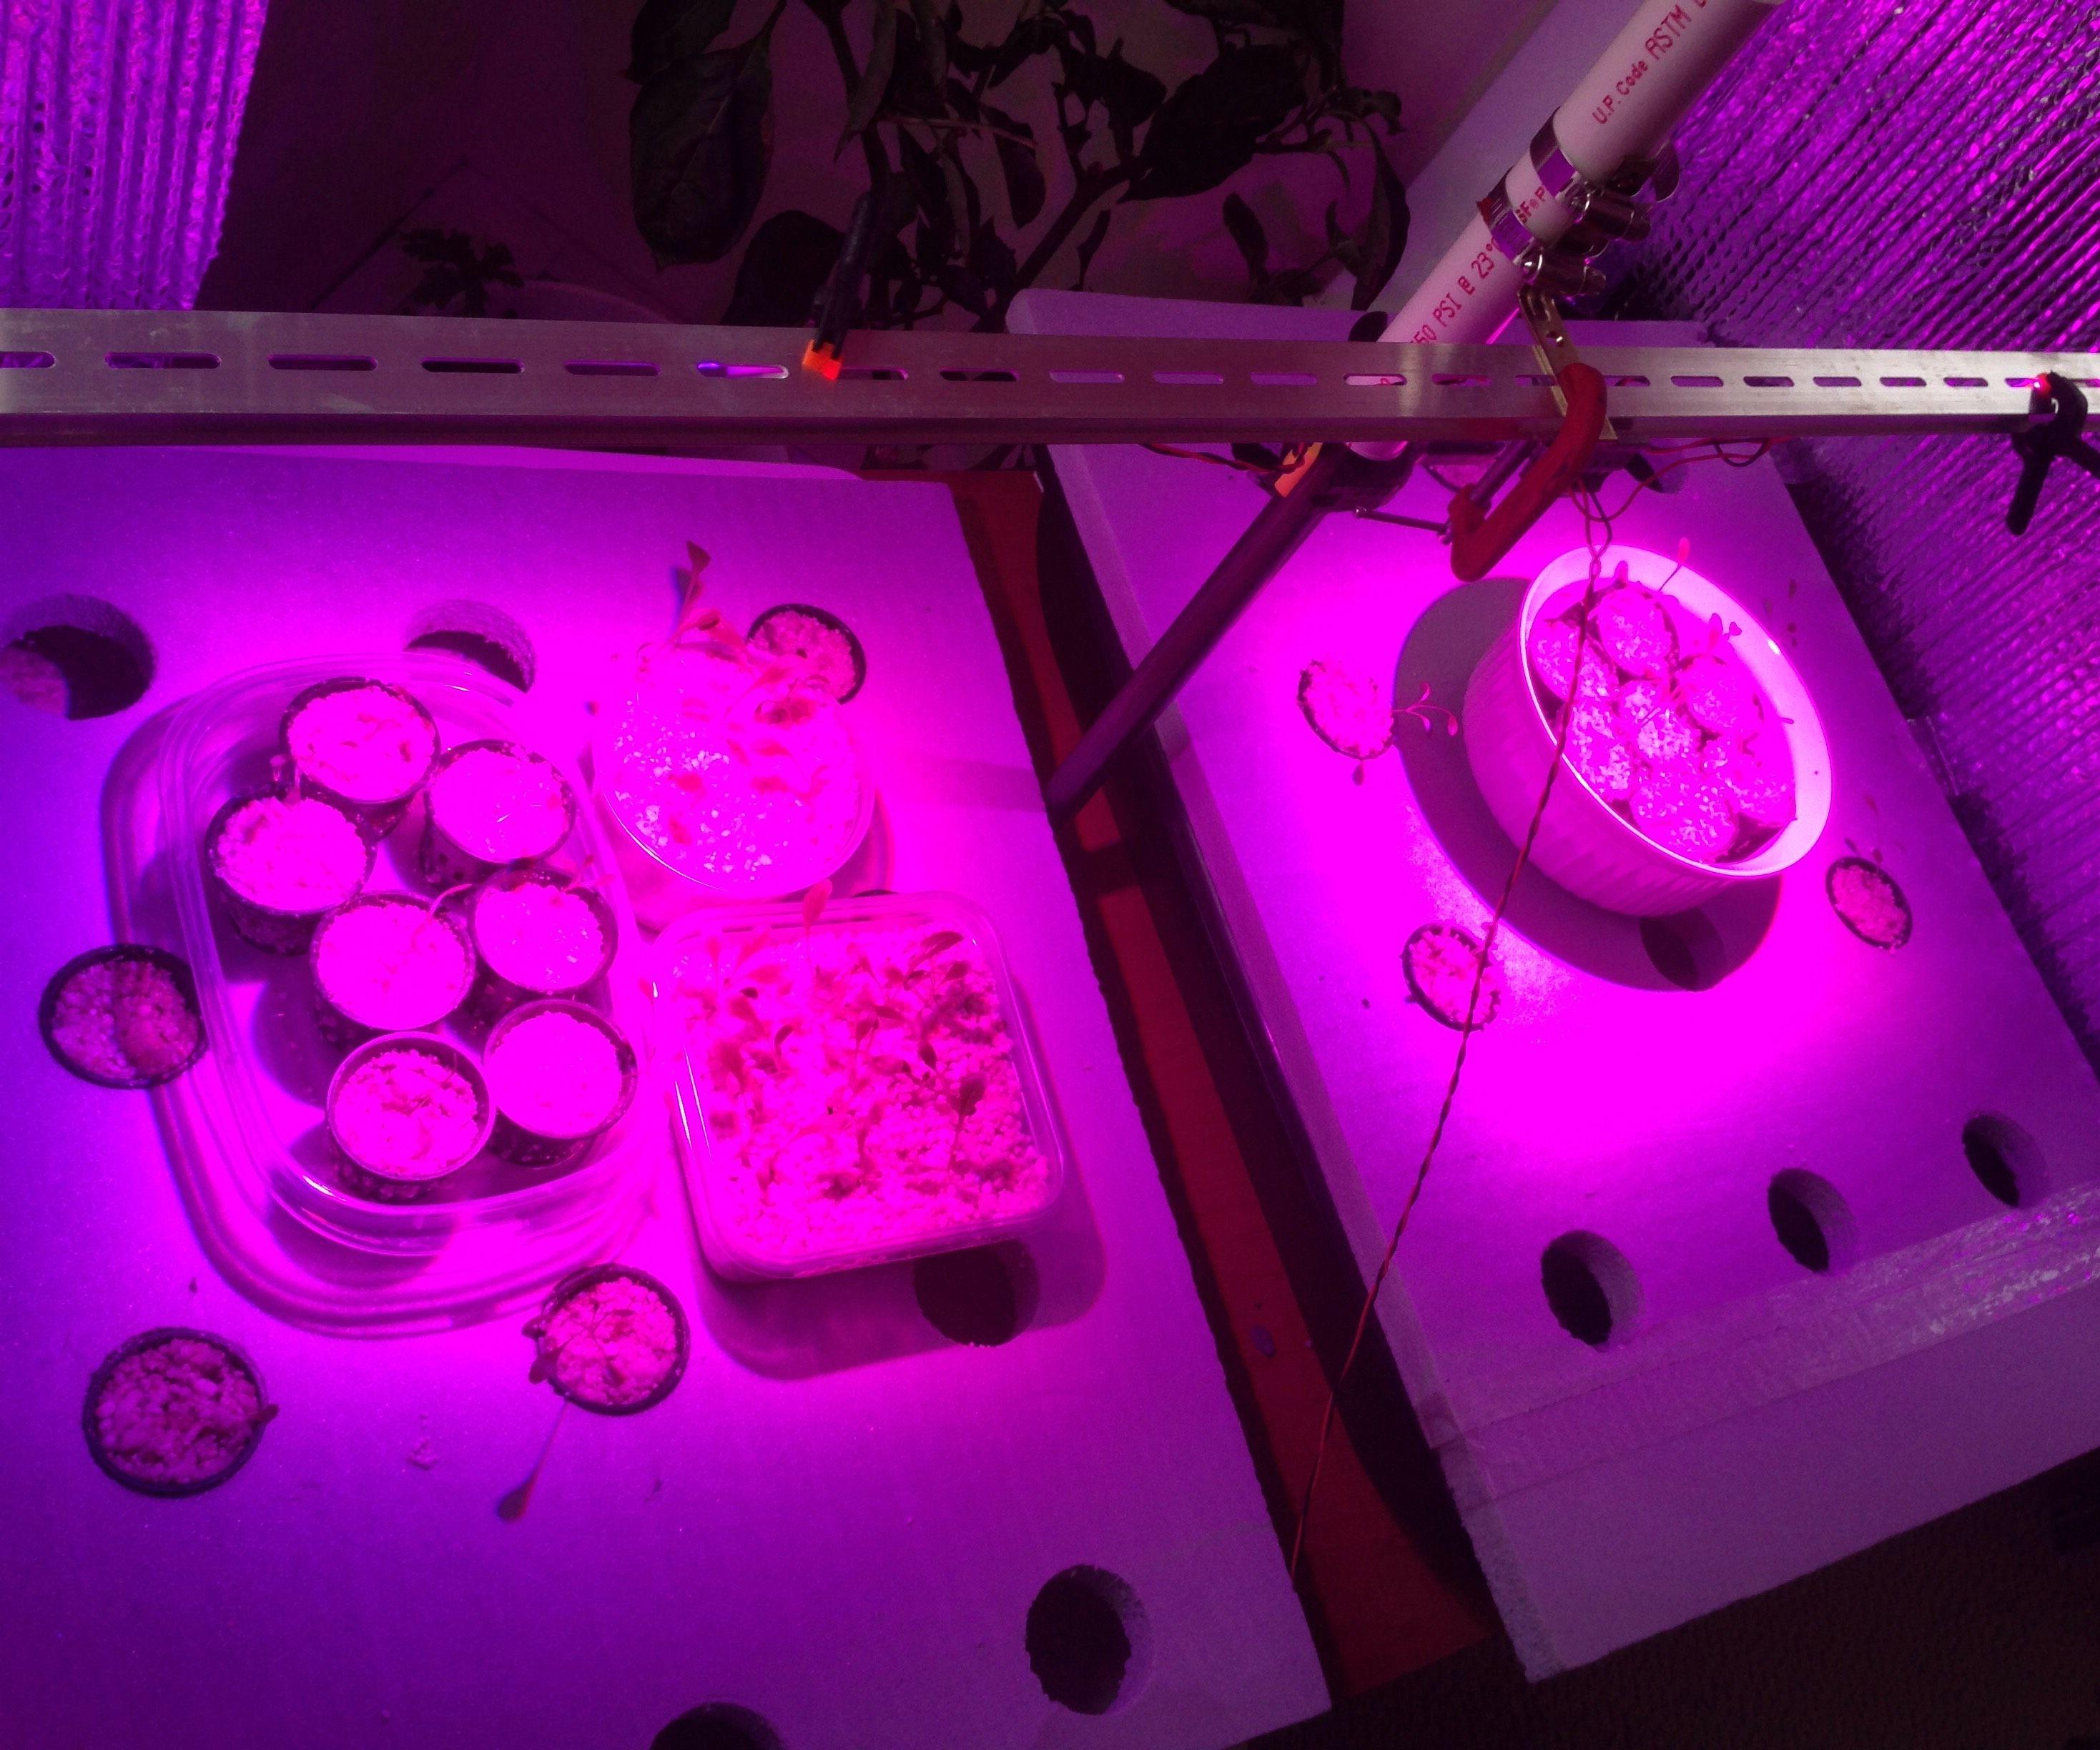 LED Grow Light using Illumitex Surexi F1 LEDs